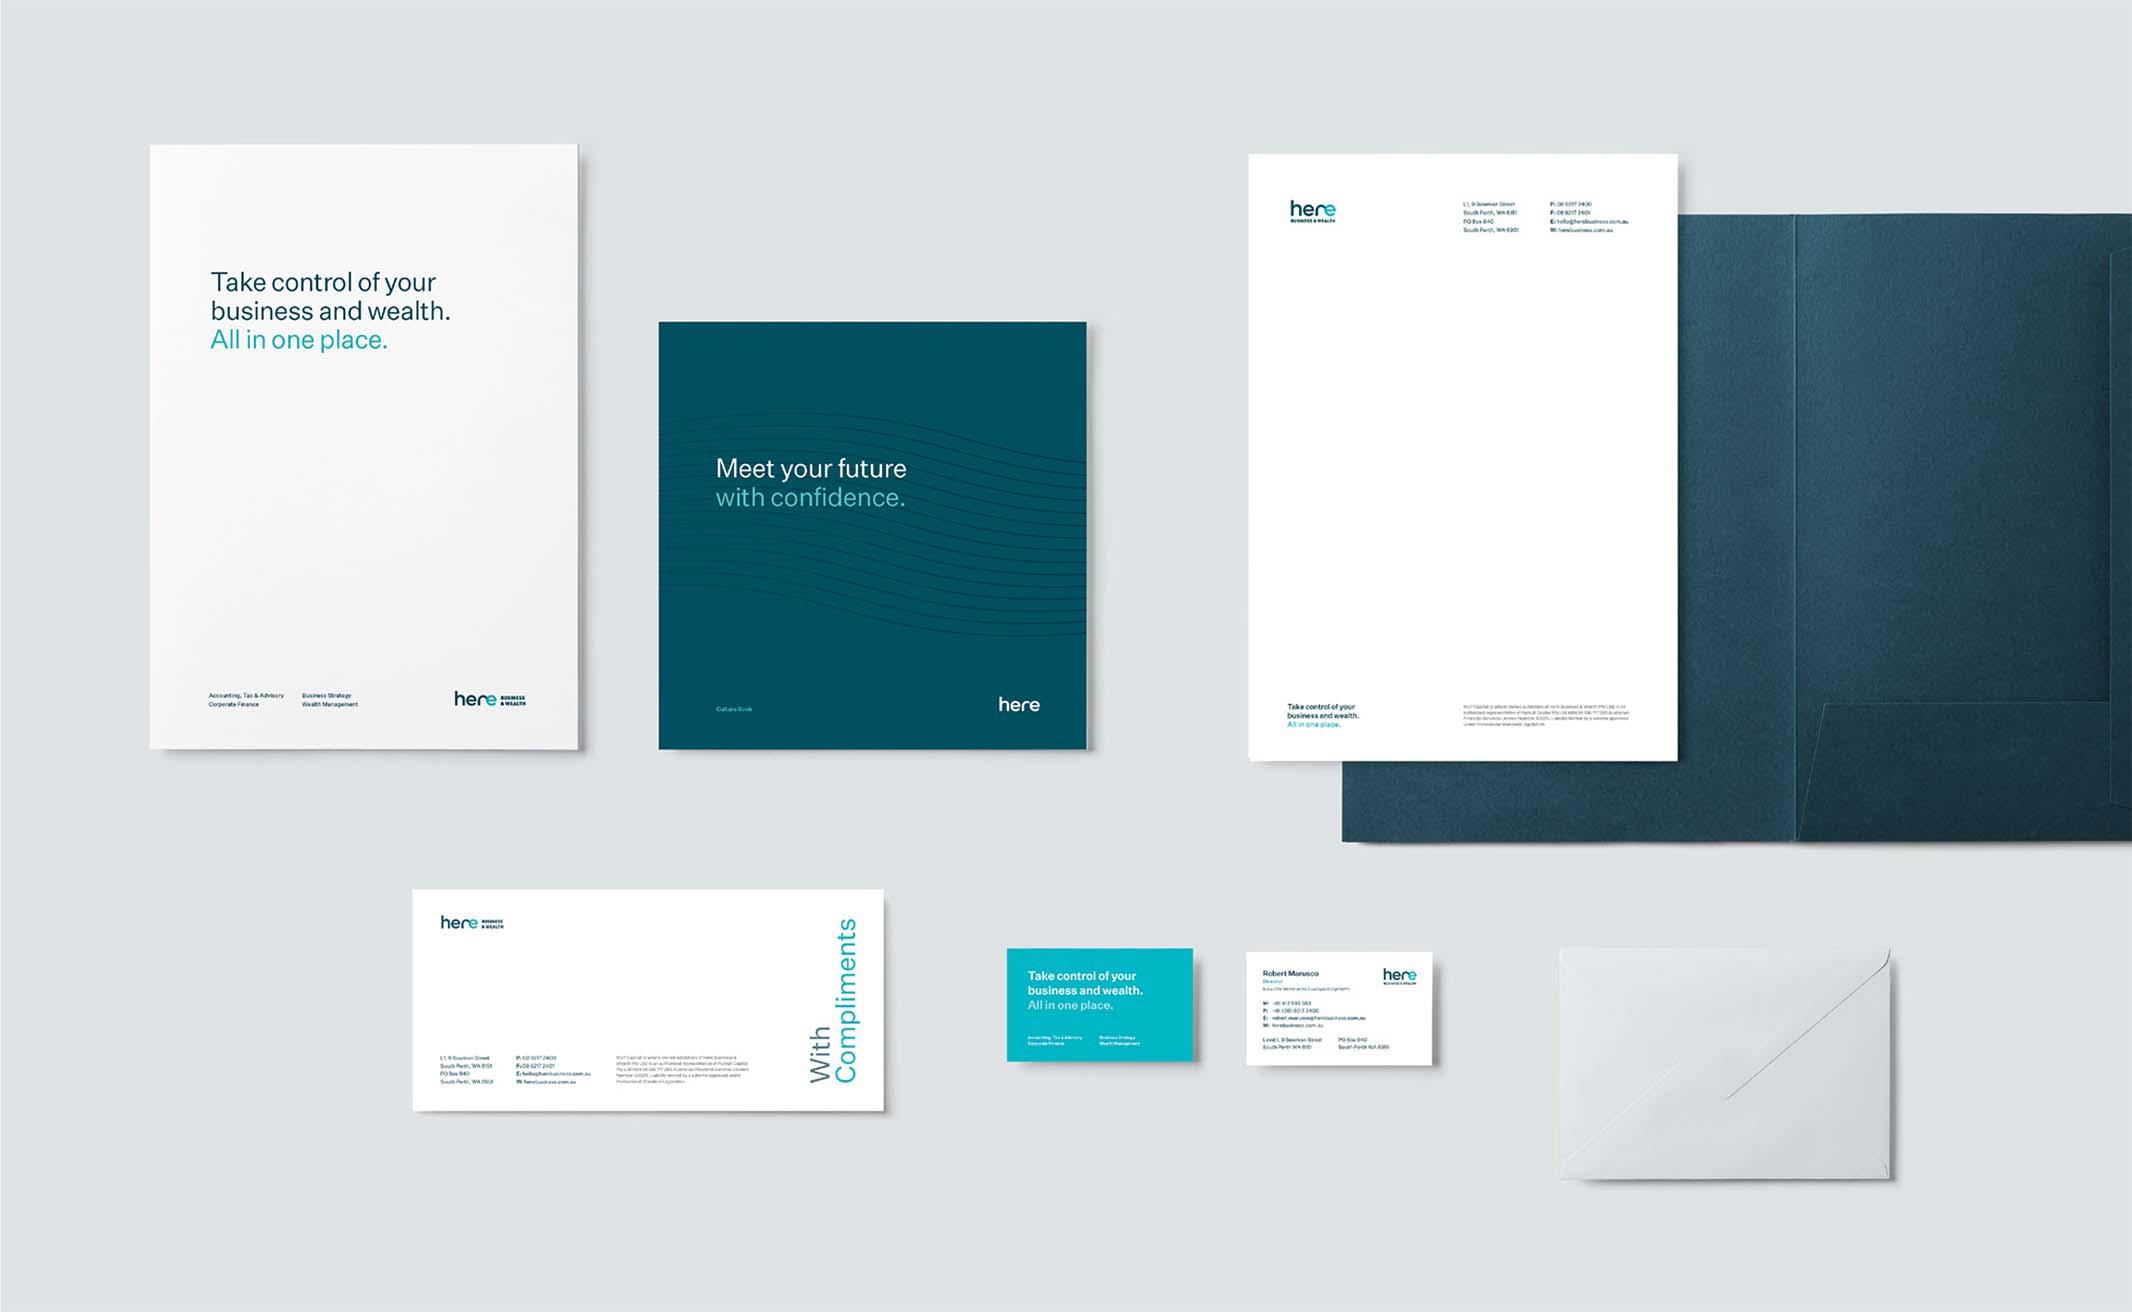 Brand Snapshot - Here Business & Wealth